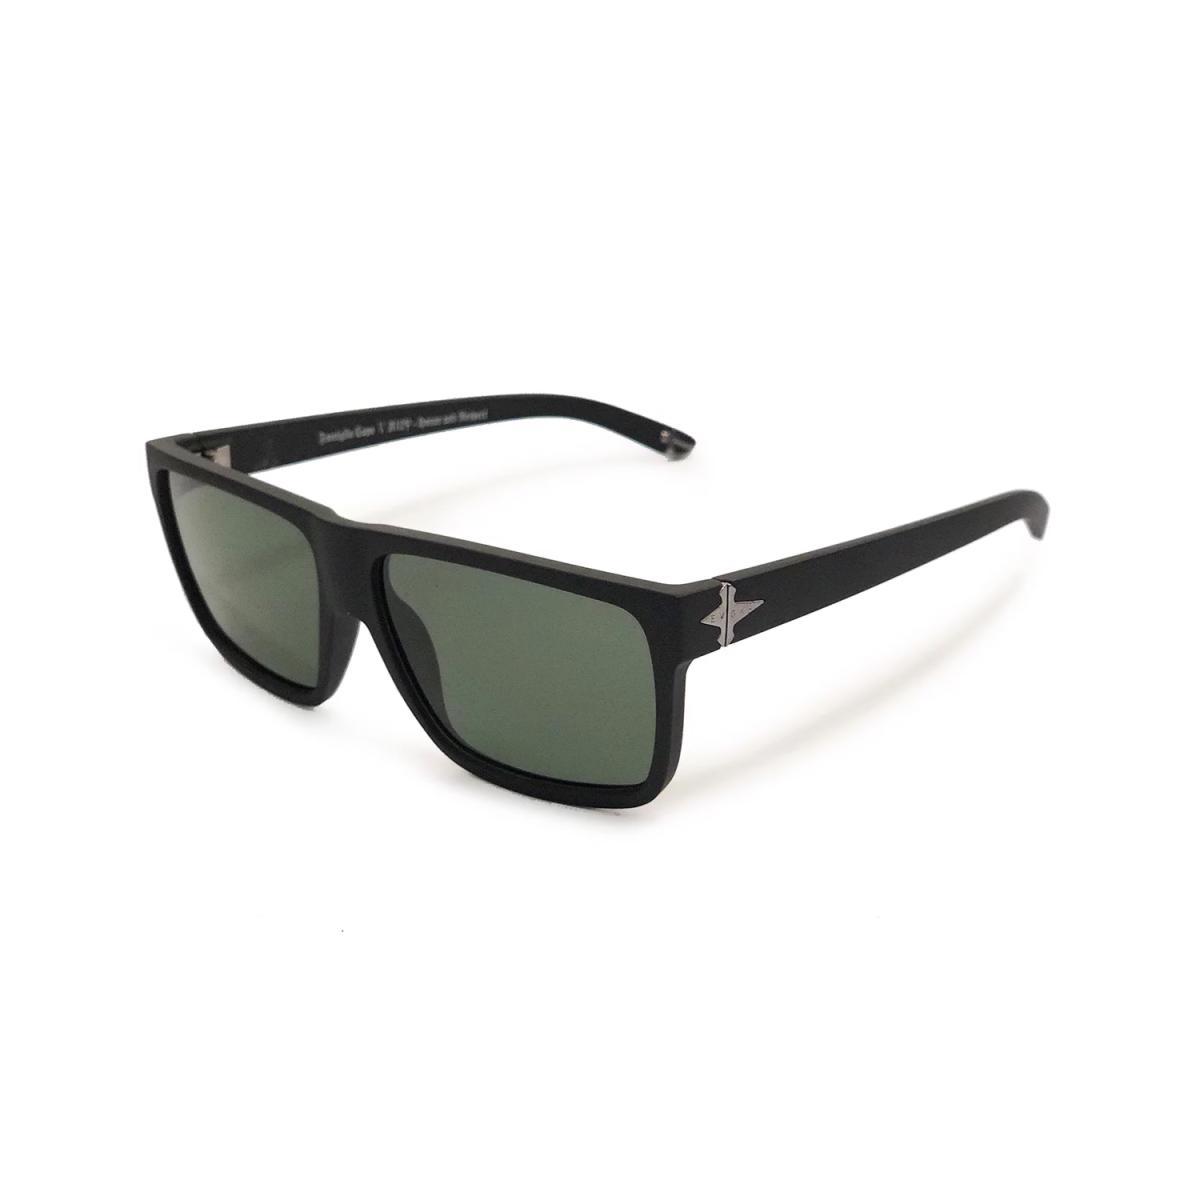 Óculos Evoke - Capo V A12P Black Matte